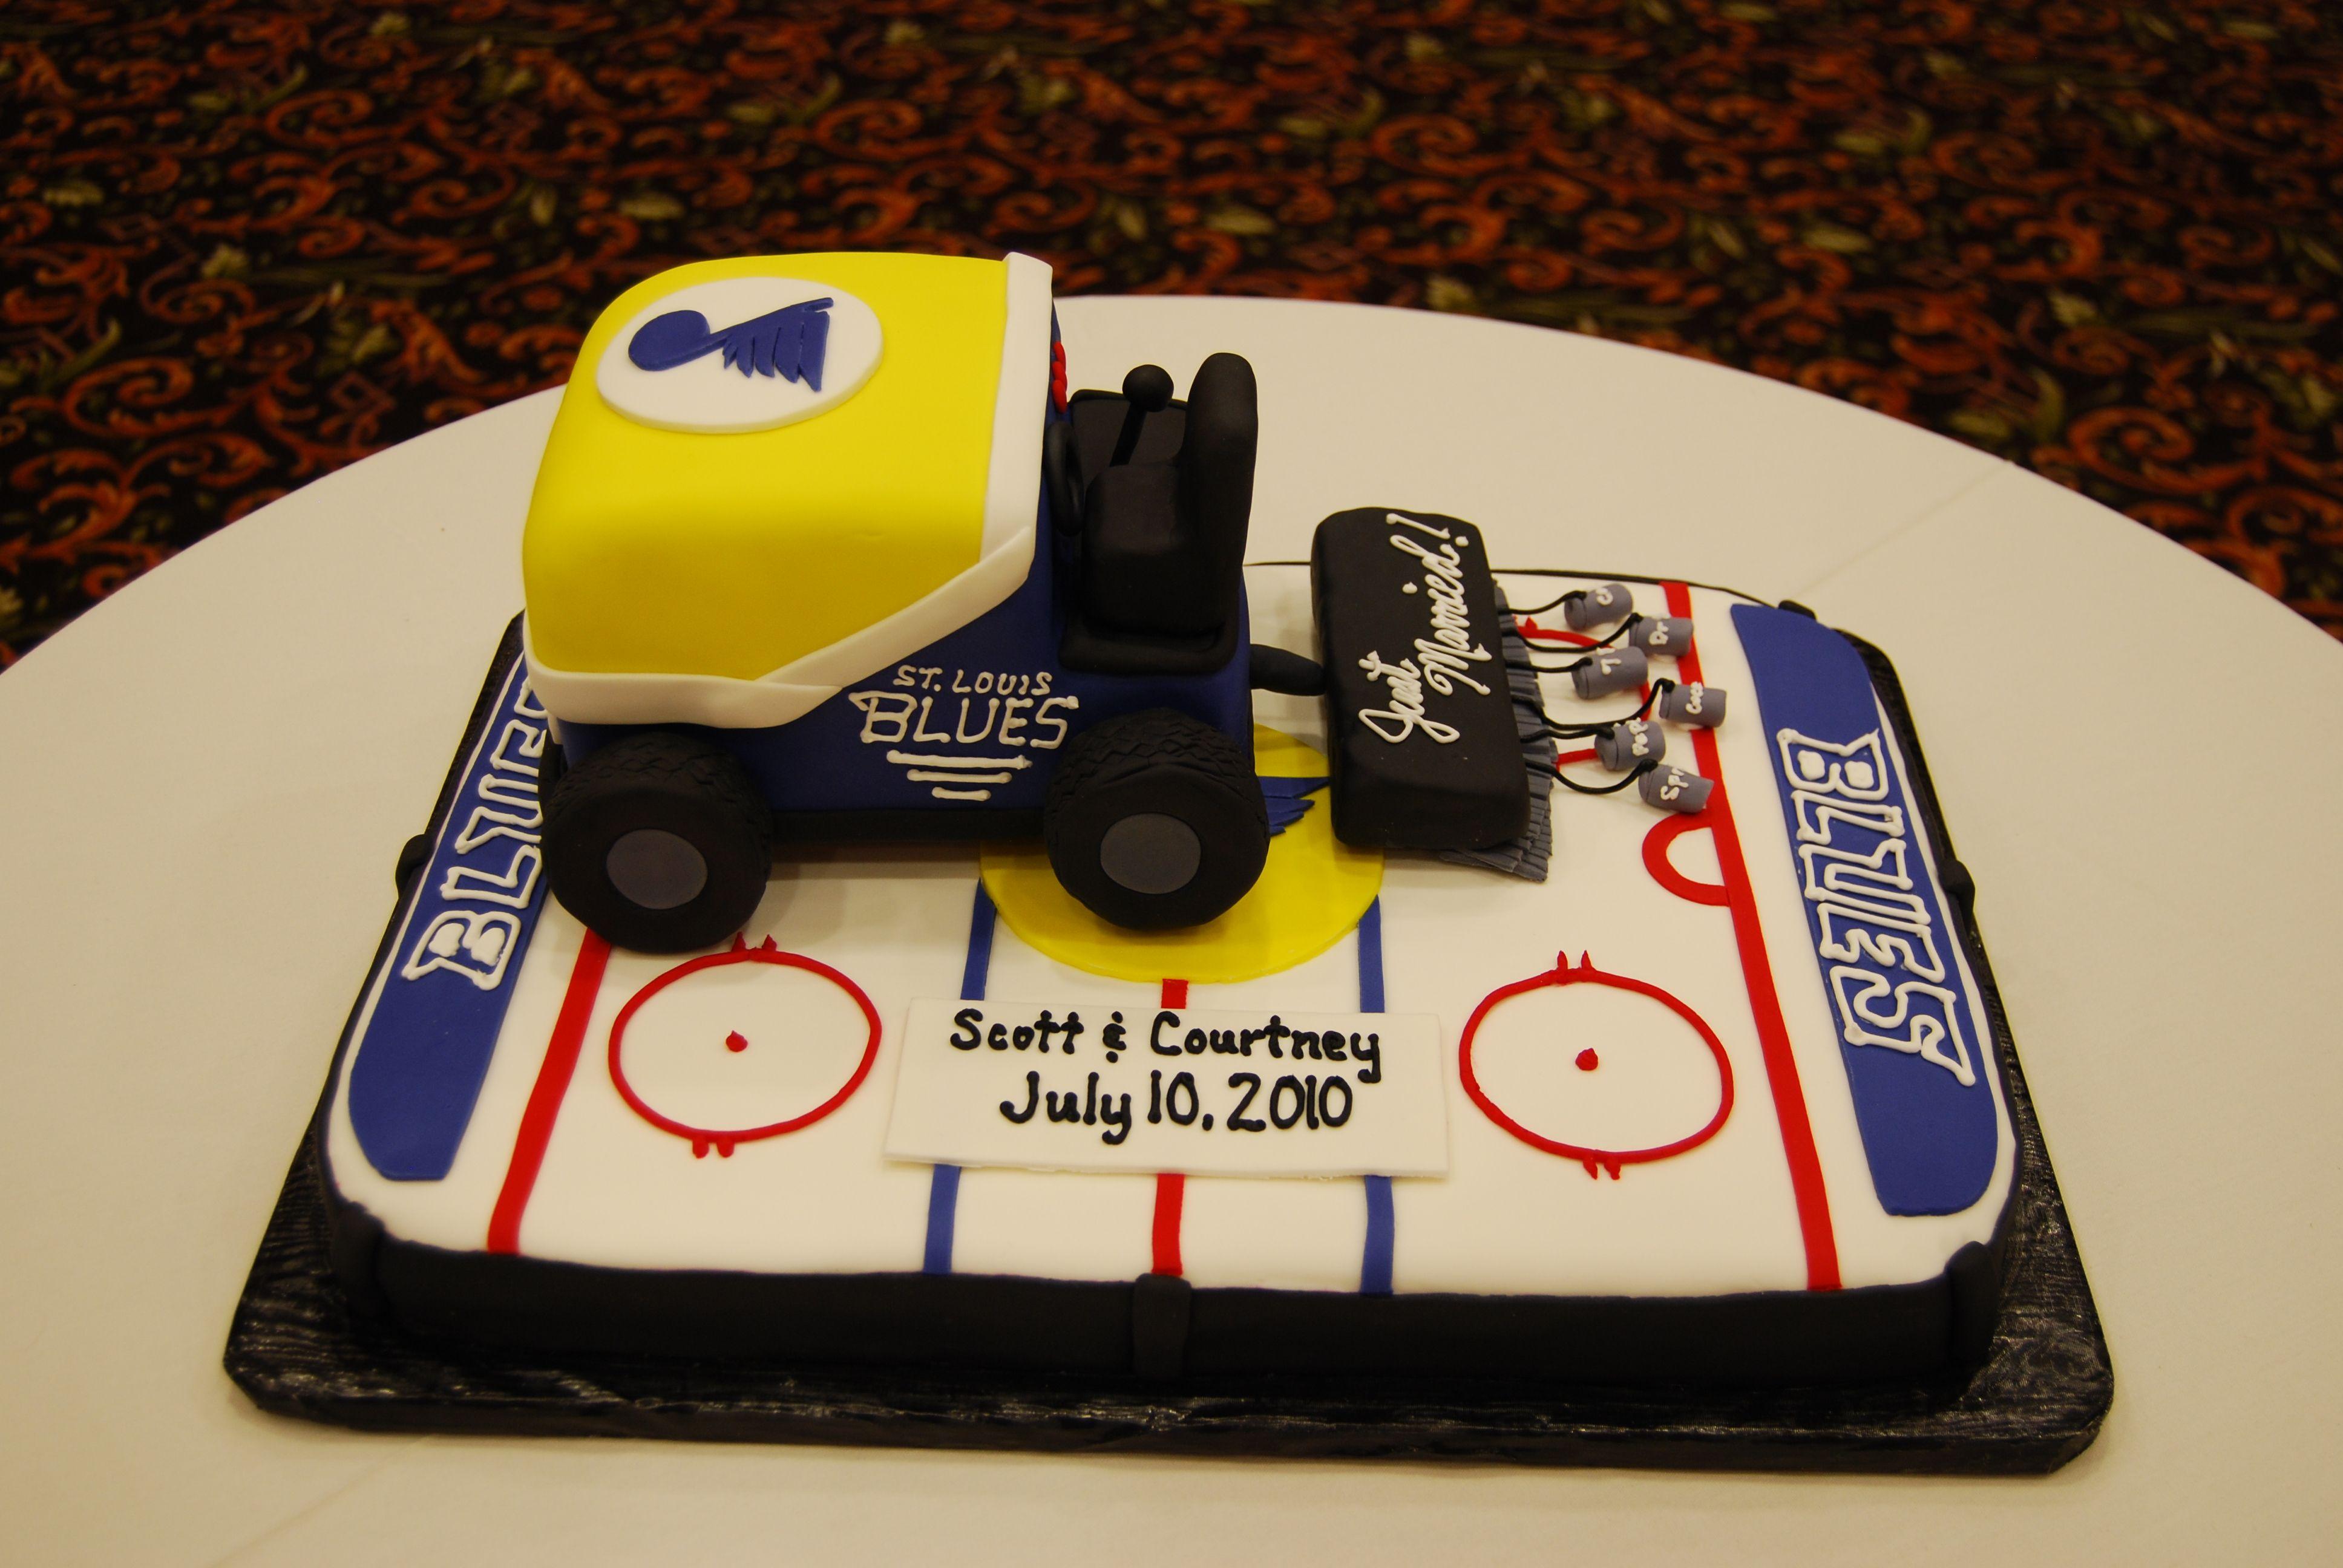 Awe Inspiring St Louis Blues Zamboni Grooms Cake Grooms Cake Hockey Cakes Funny Birthday Cards Online Alyptdamsfinfo